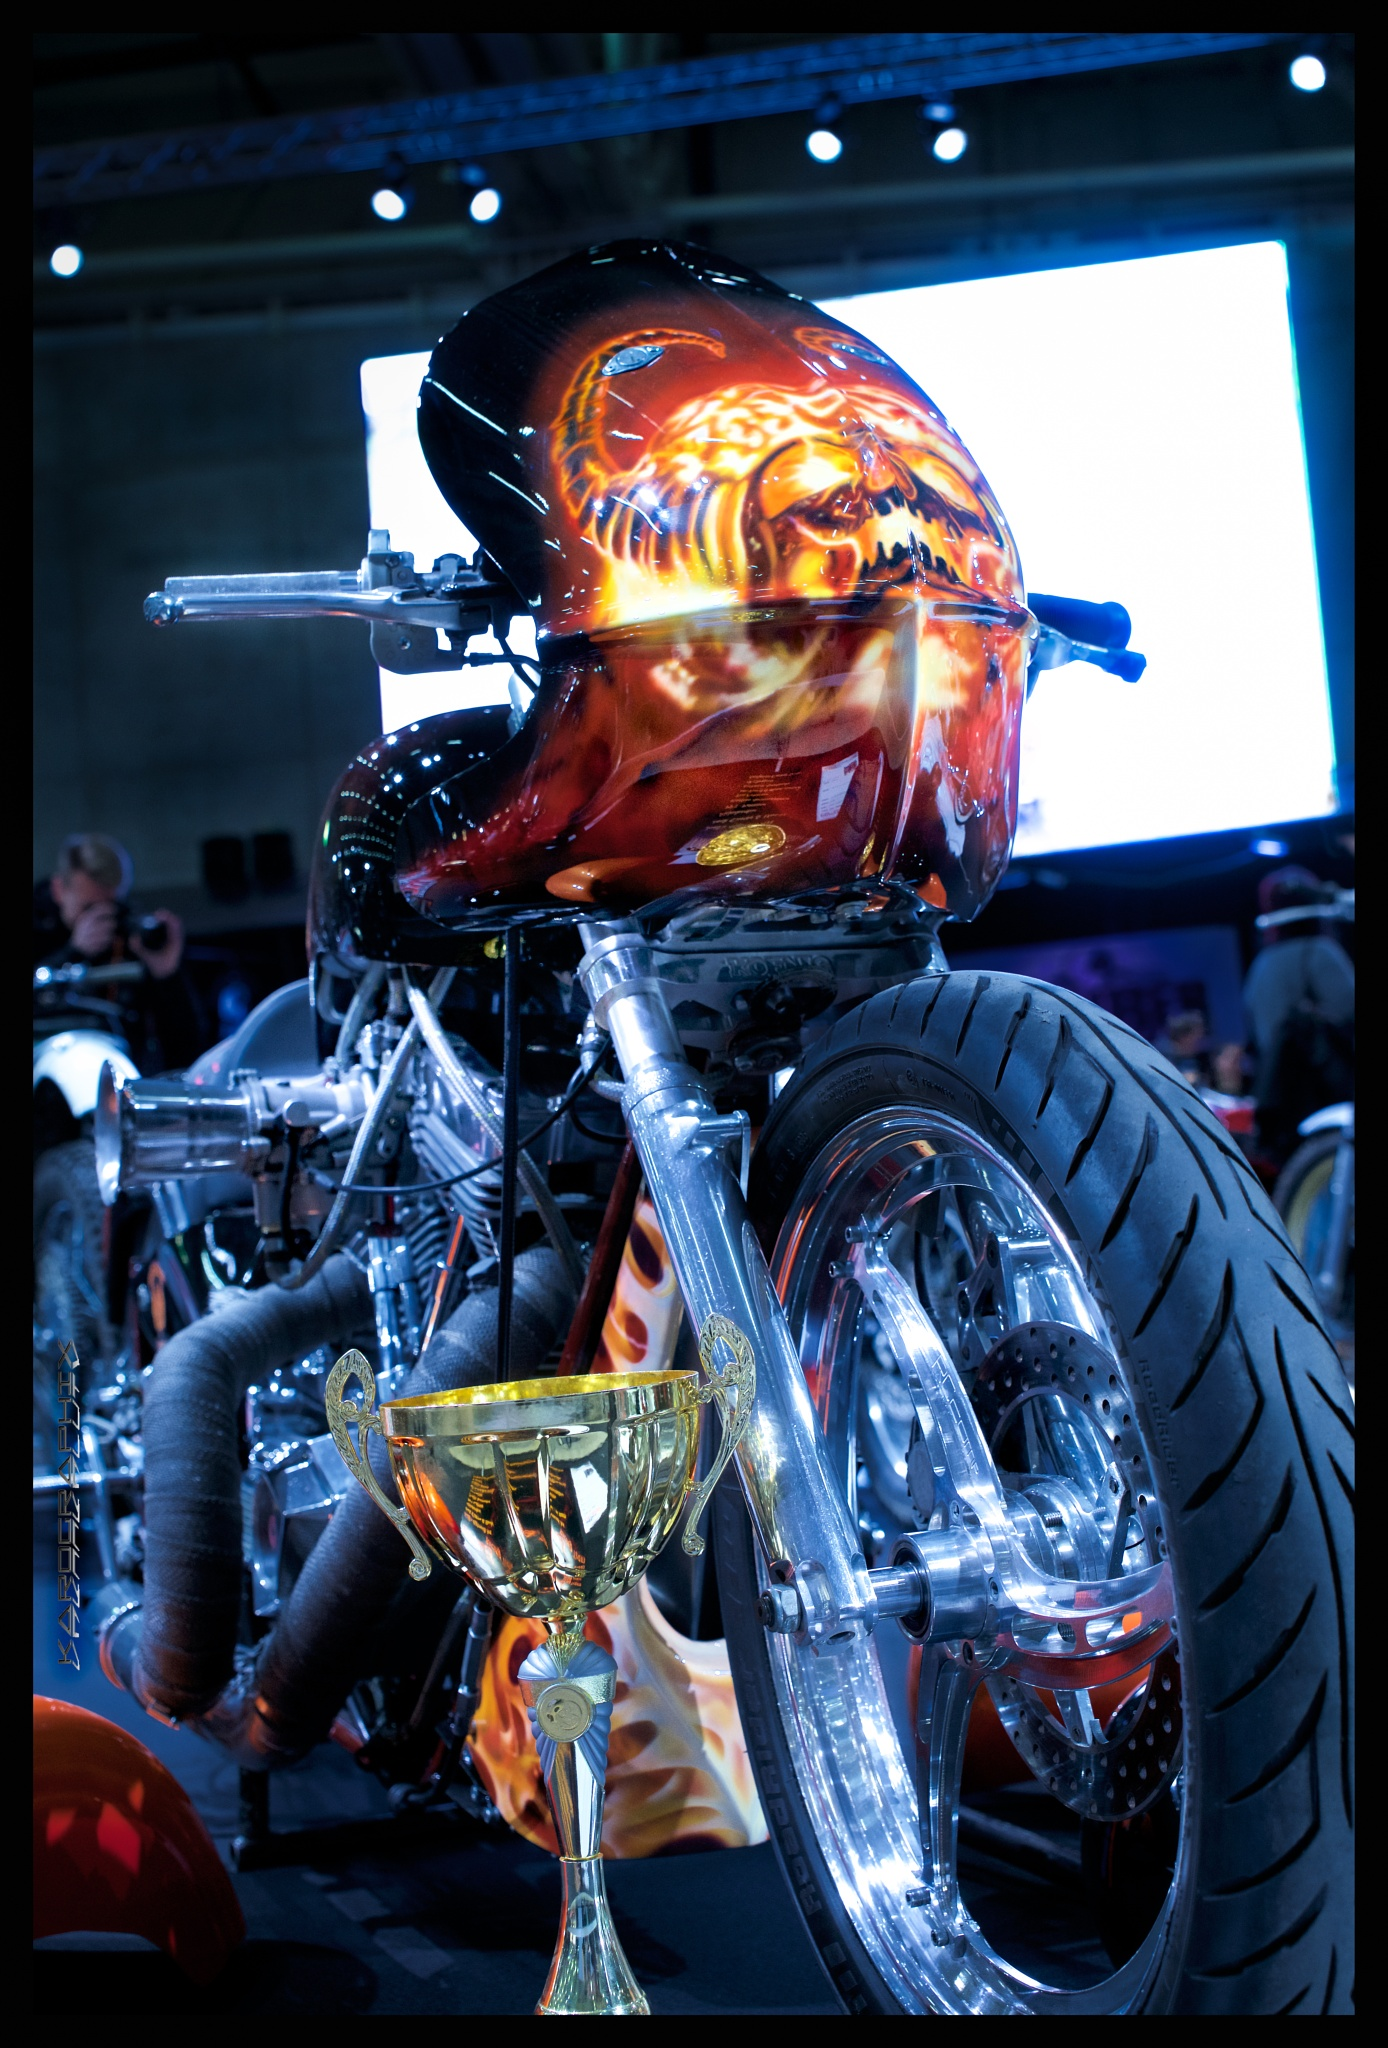 Demon bike by Karographix